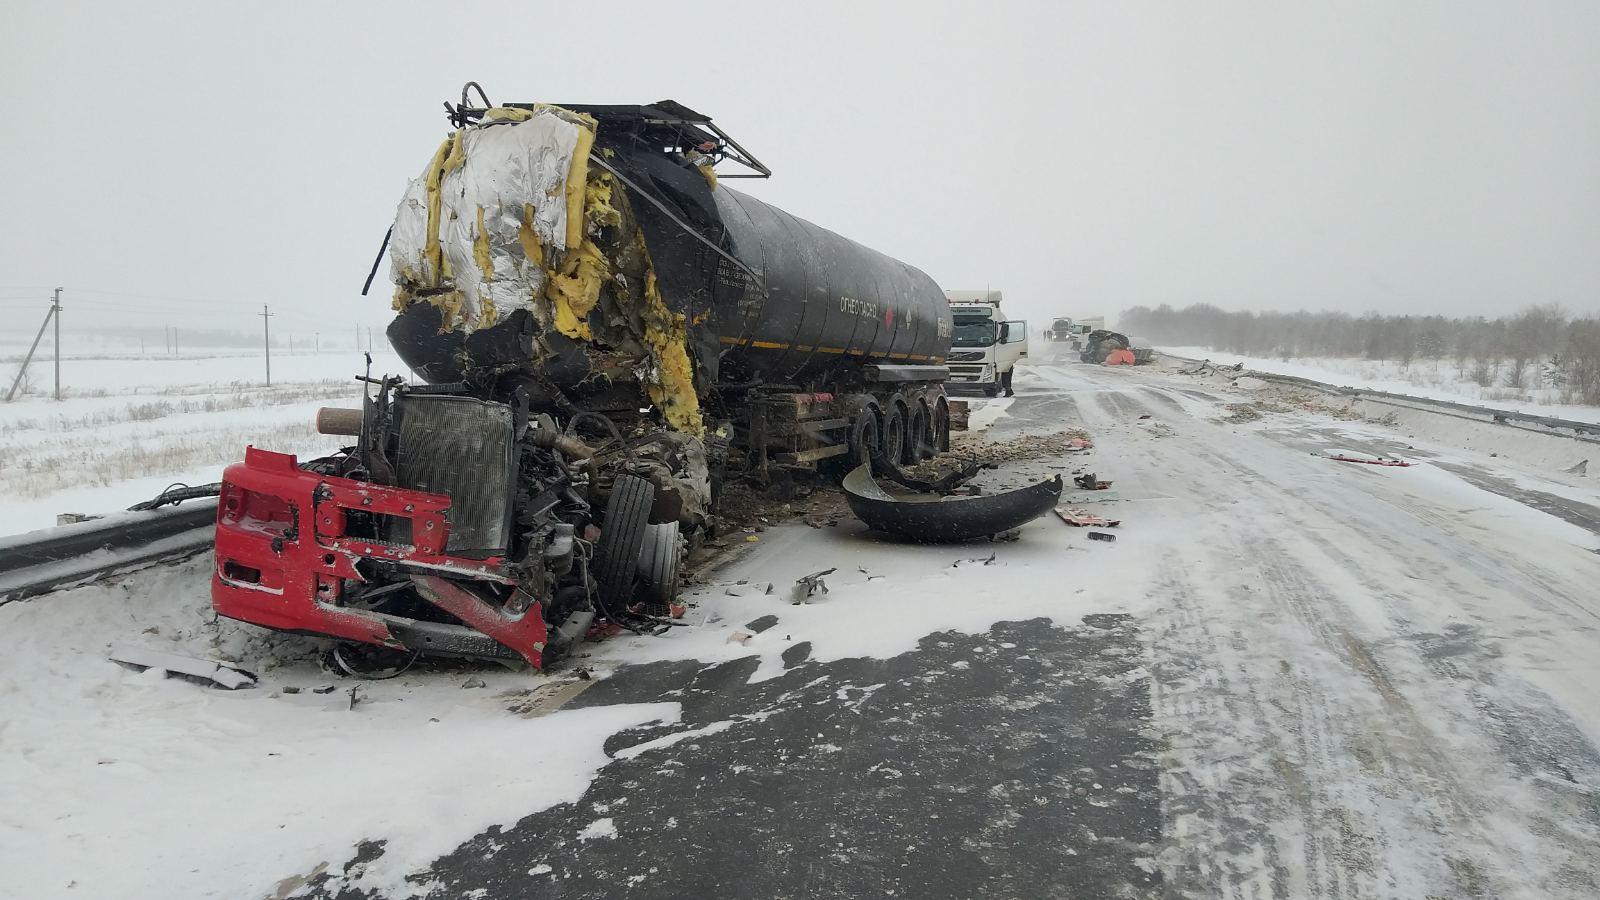 На трассе М-5 в Самарской области в аварии у грузовика снесло кабину